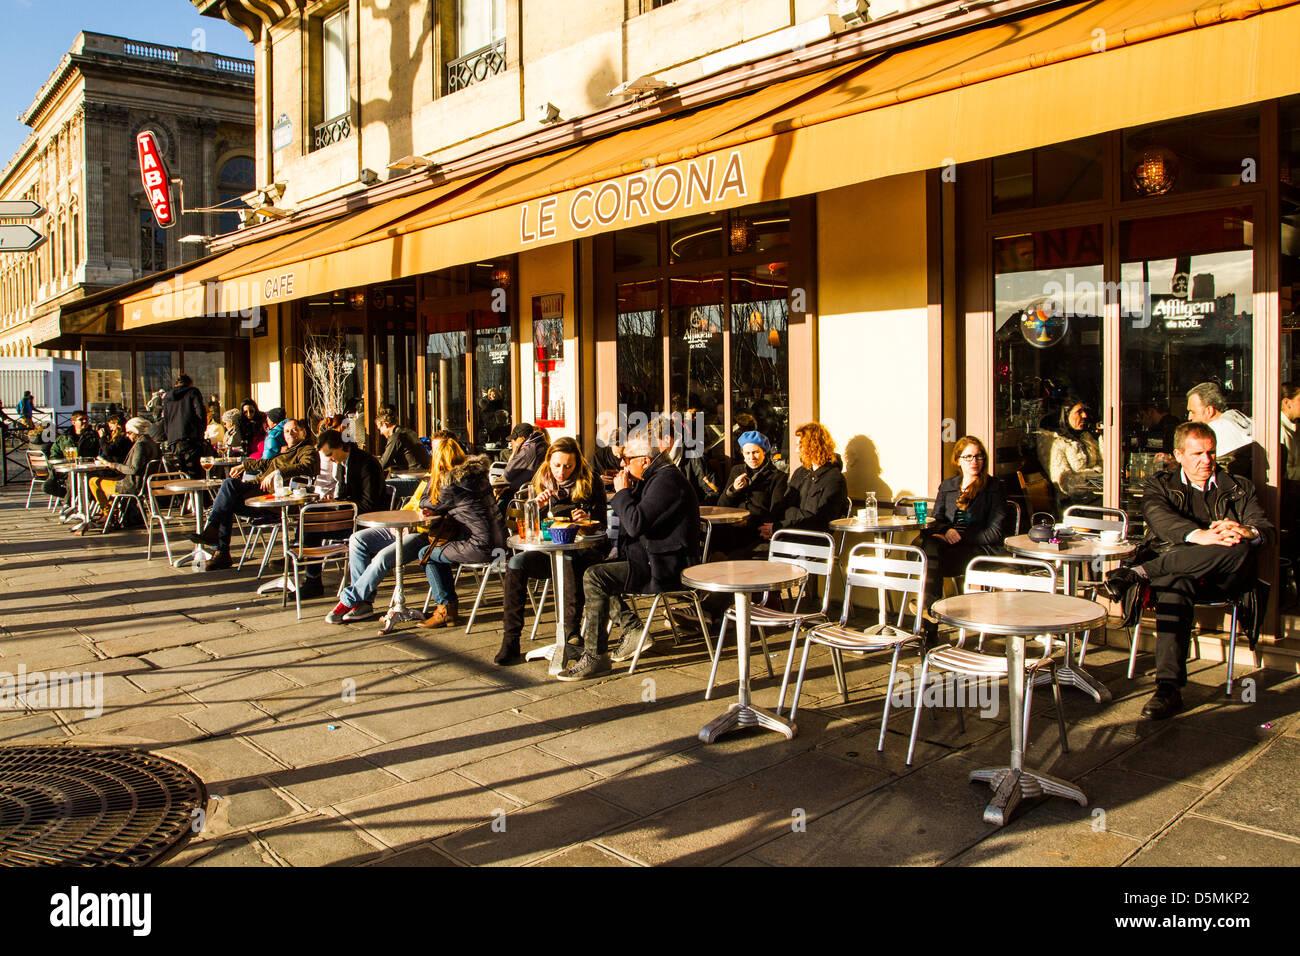 Sidewalk cafe at Quai du Louvre. - Stock Image